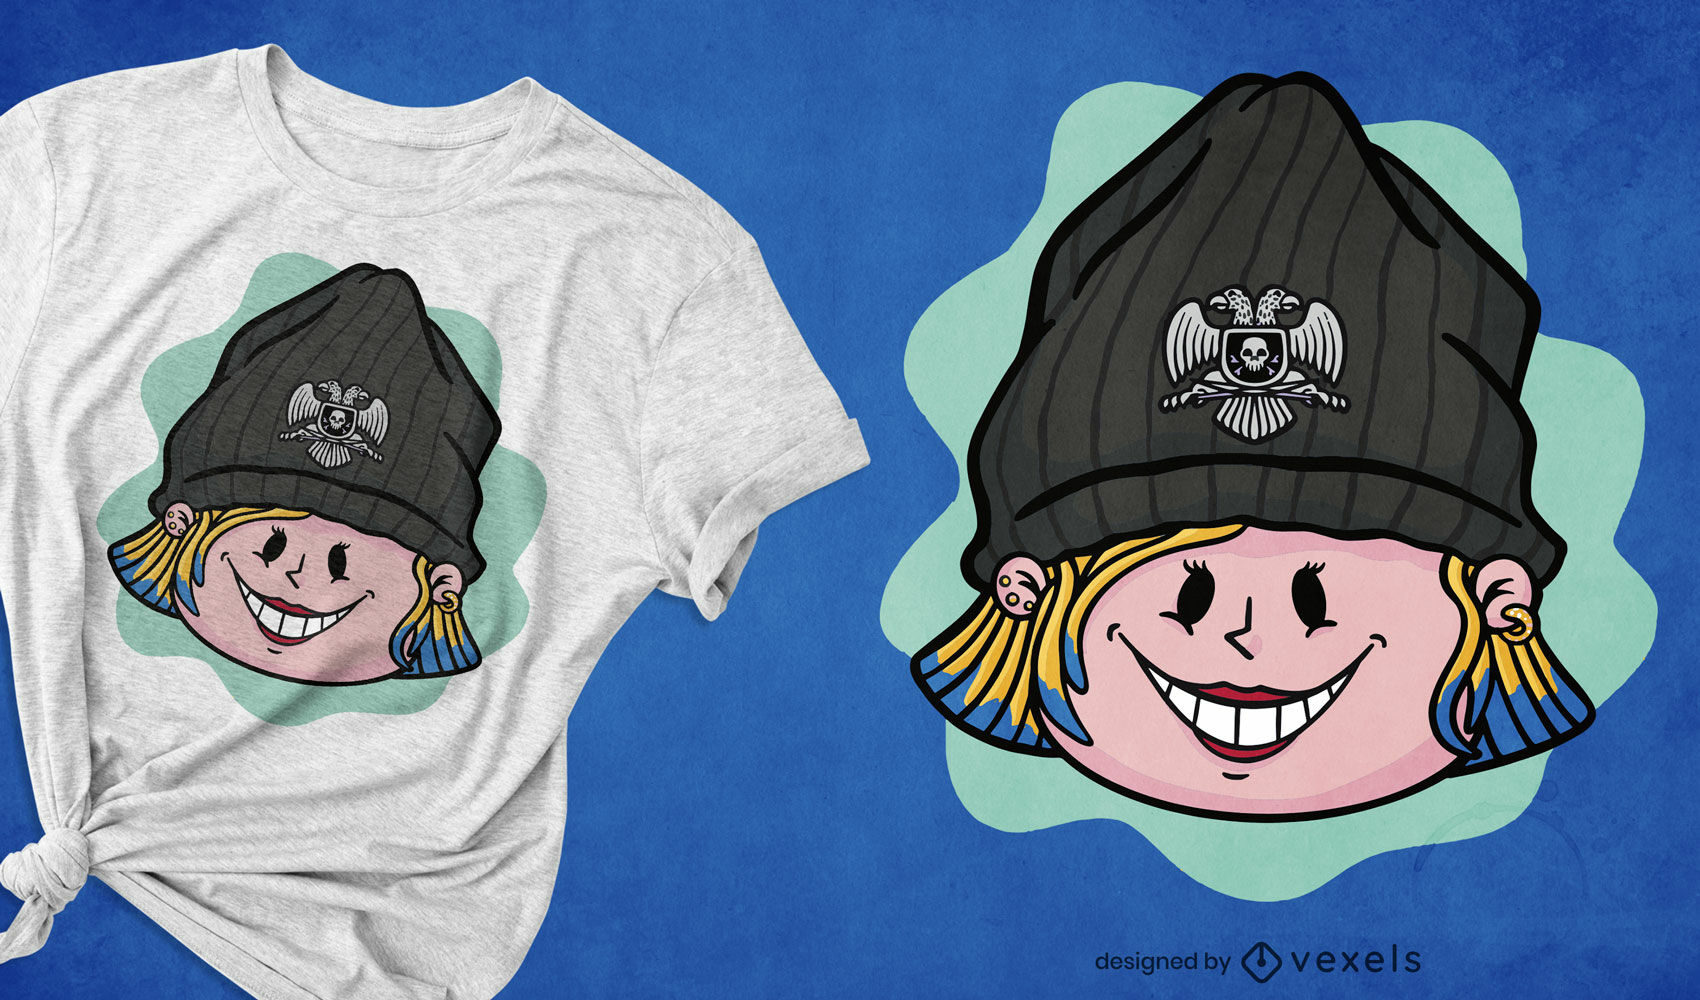 Cool girl with hat cartoon t-shirt design